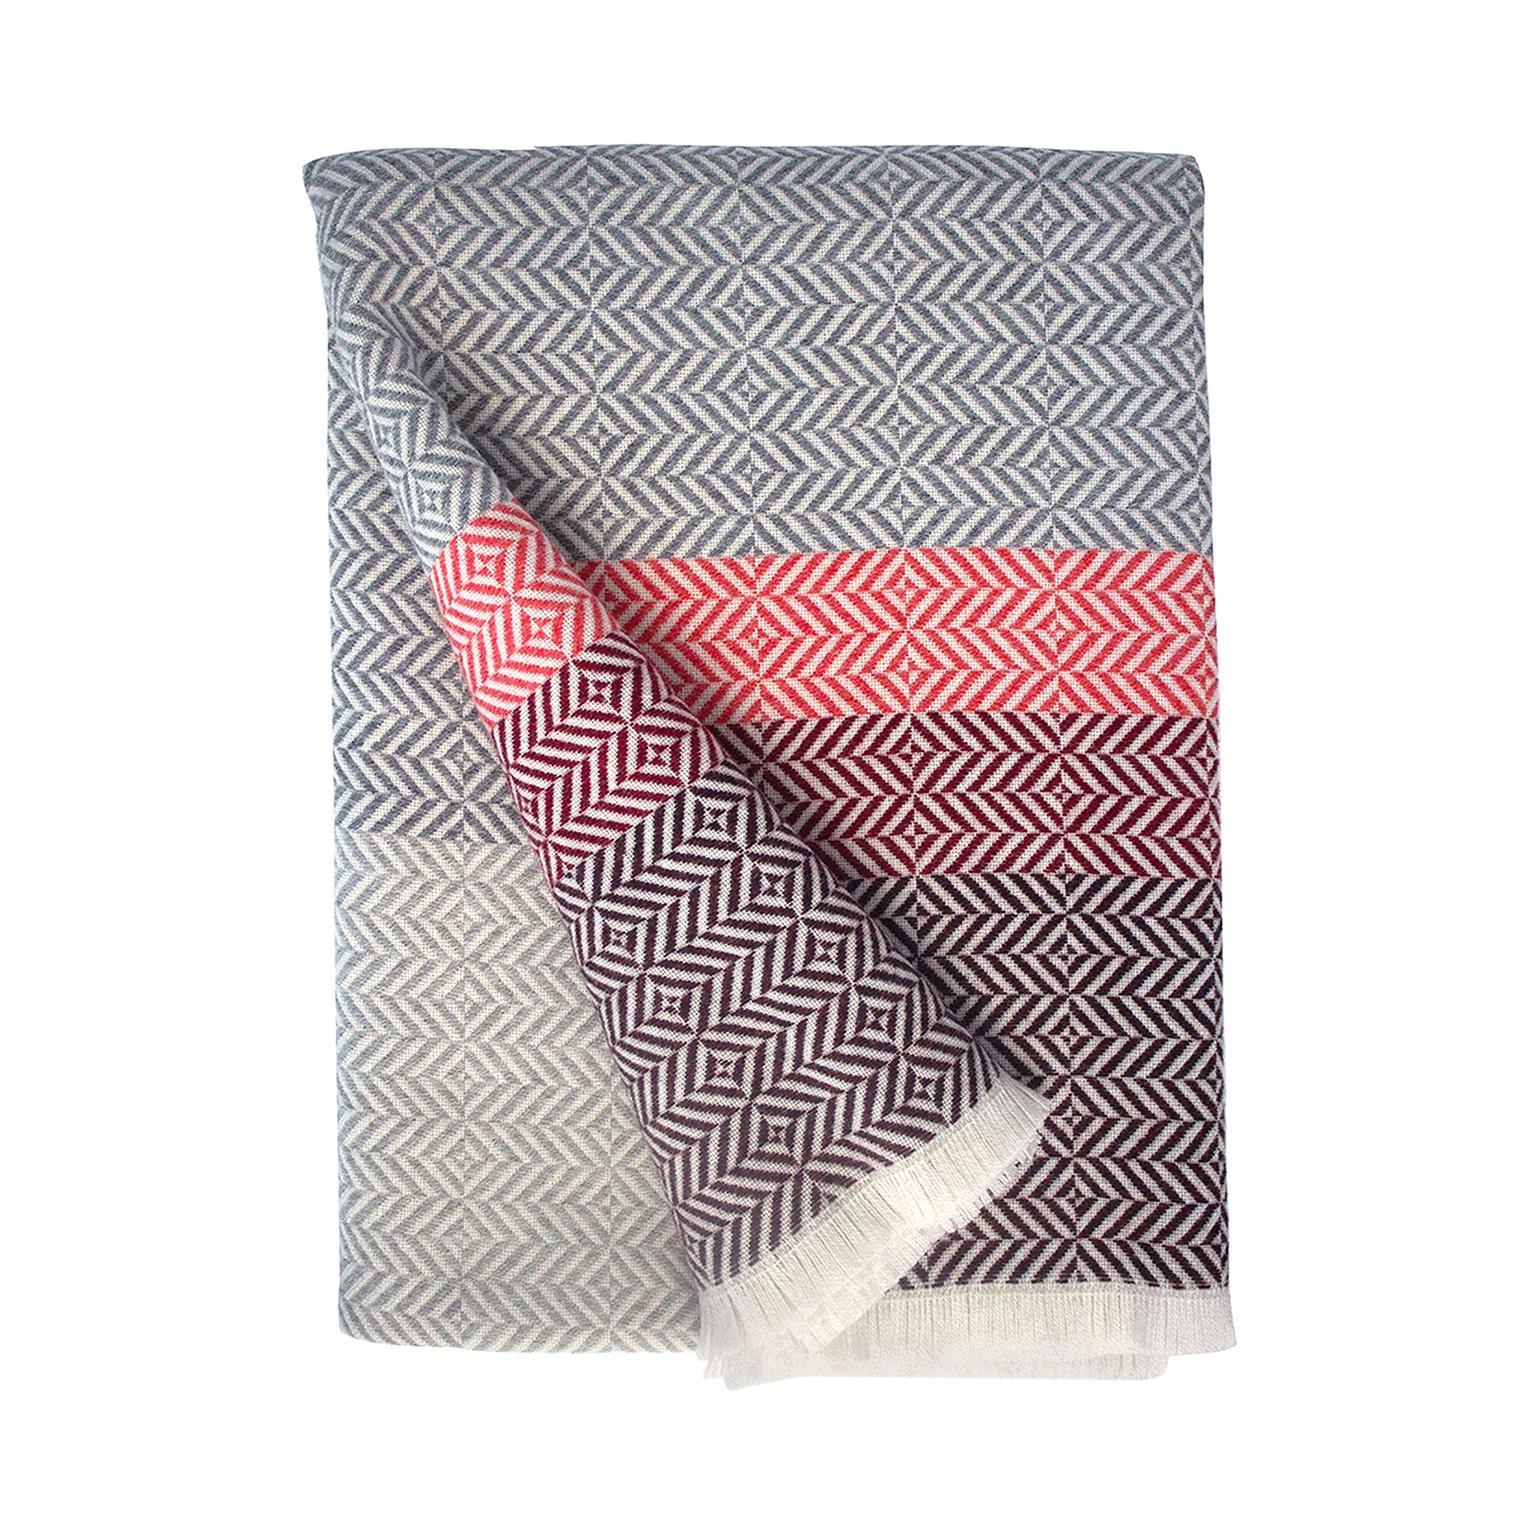 'Uccle' Woven Block Geometric Merino Wool Throw, Papaya /Pink/Burgundy/Greys